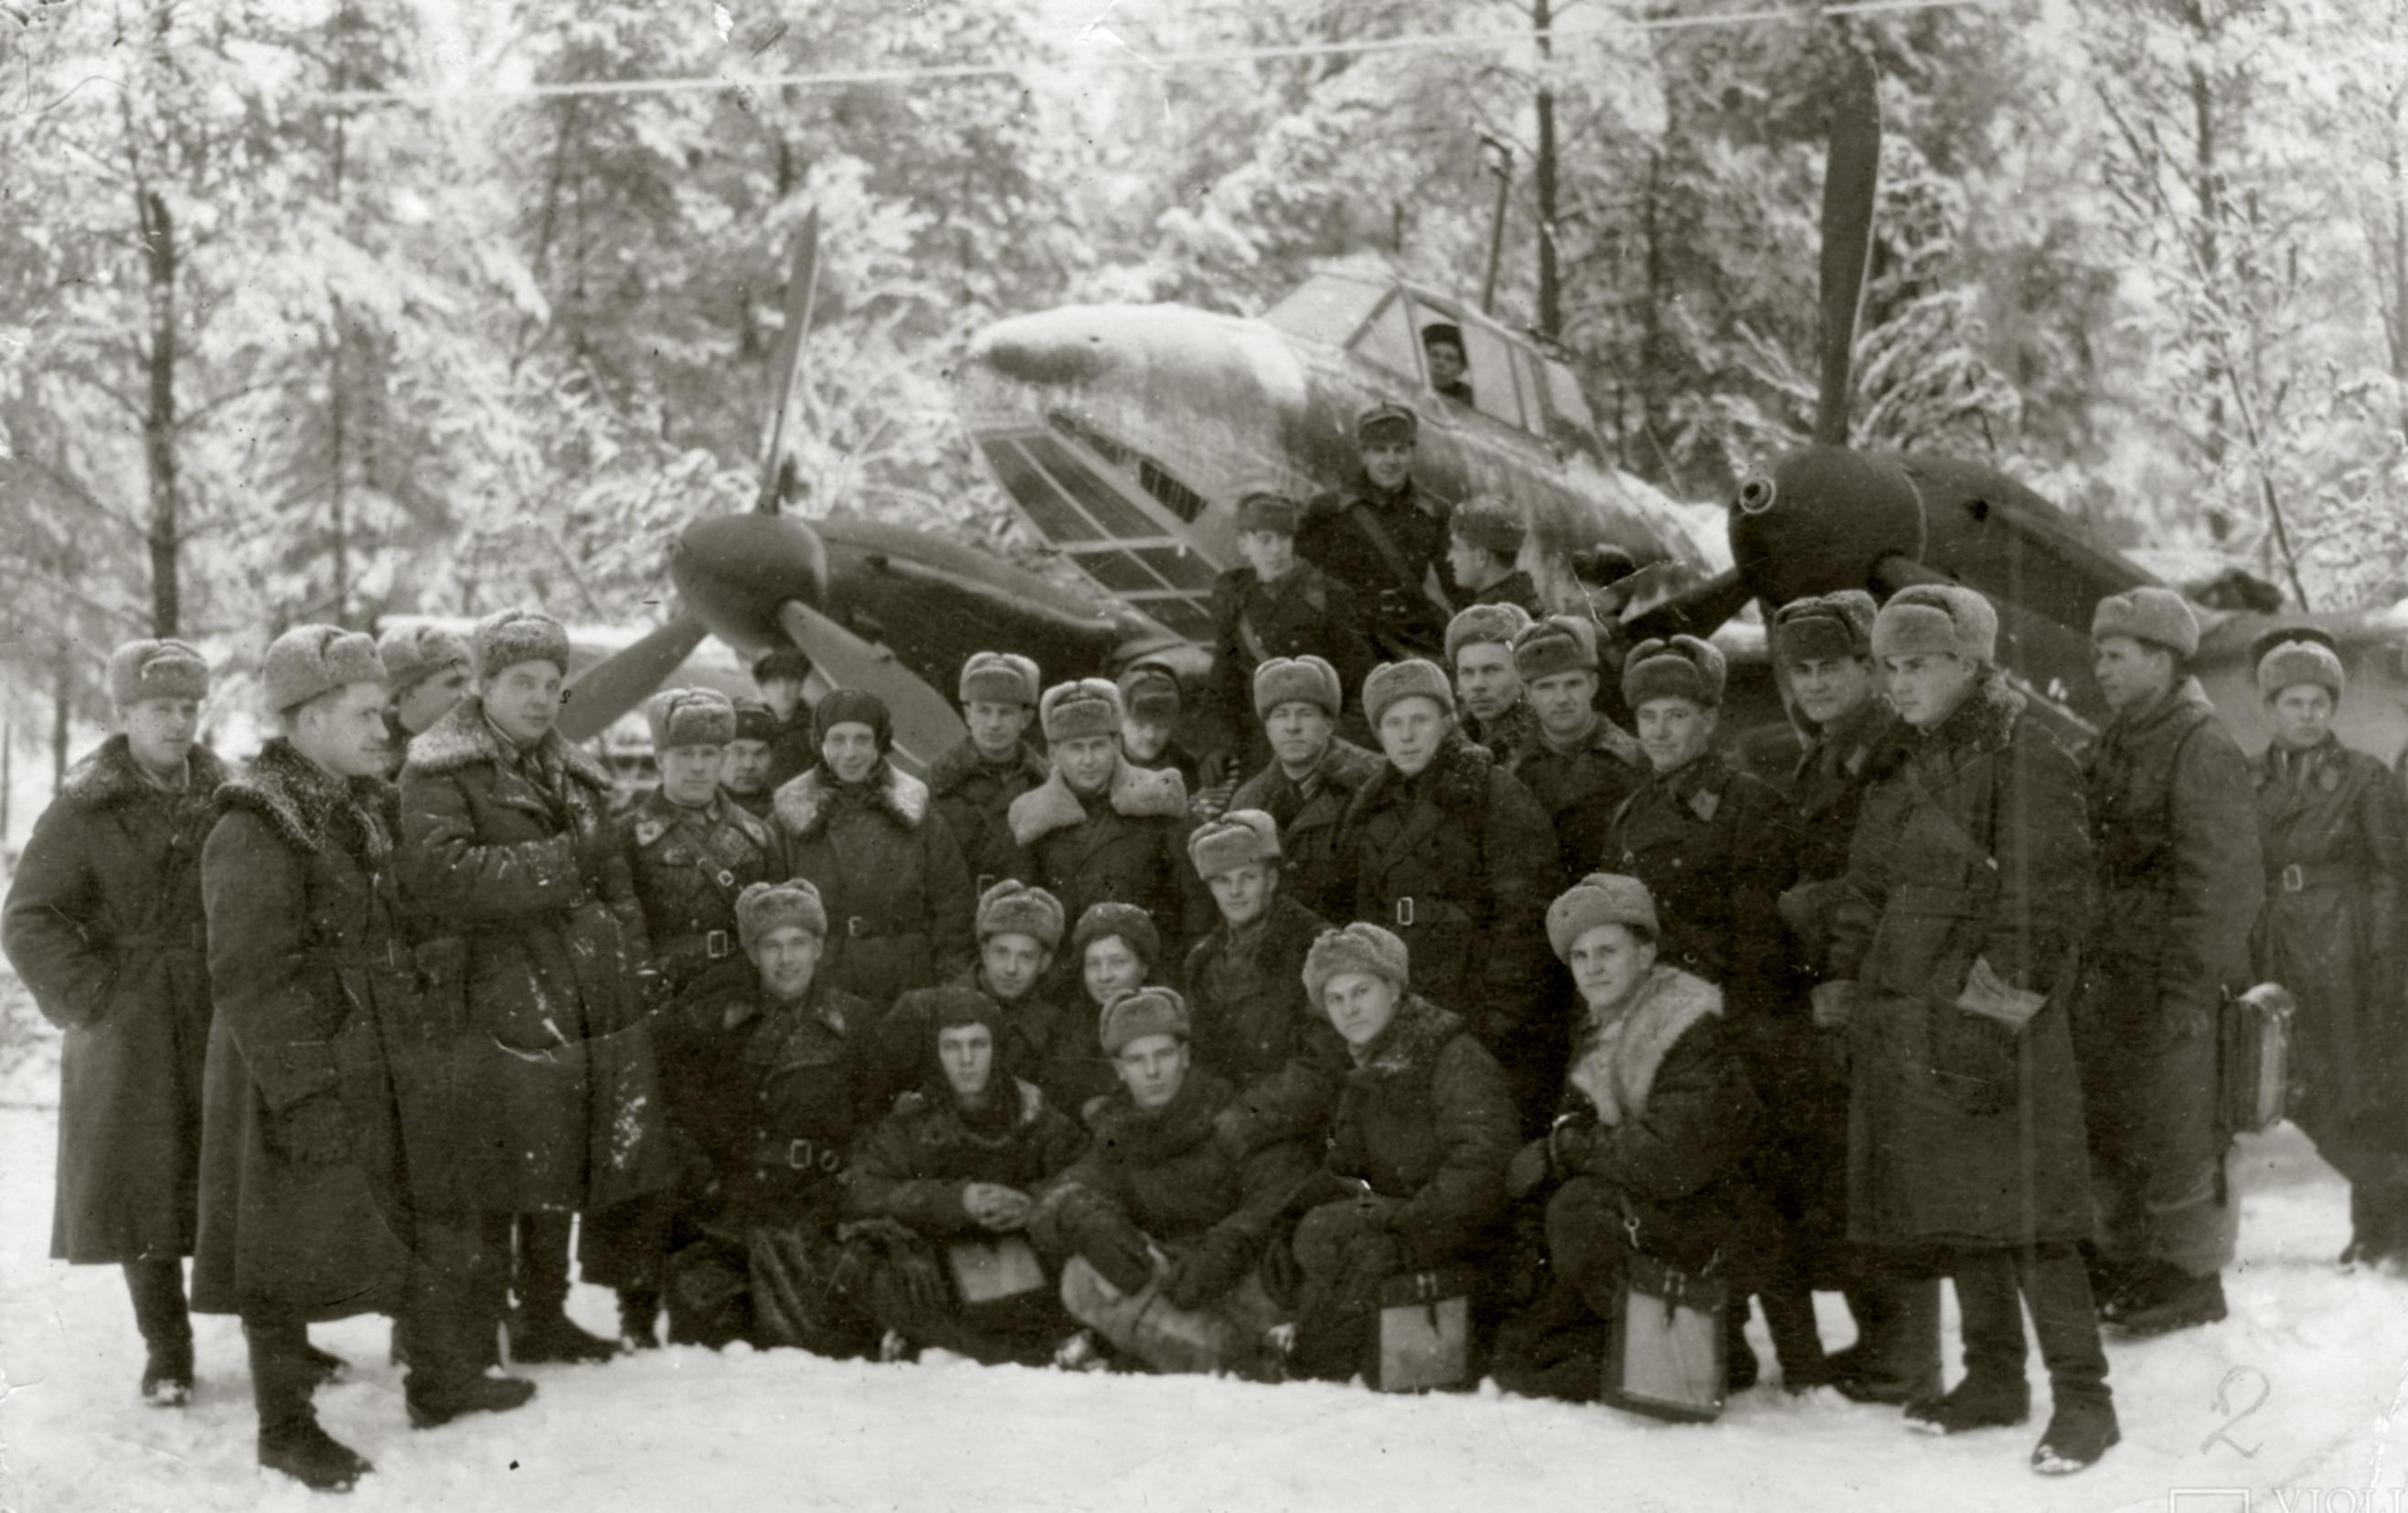 Aircrew Soviet 72ORAP commander and group photo taken at Makarovo airfield Jan 1943 01